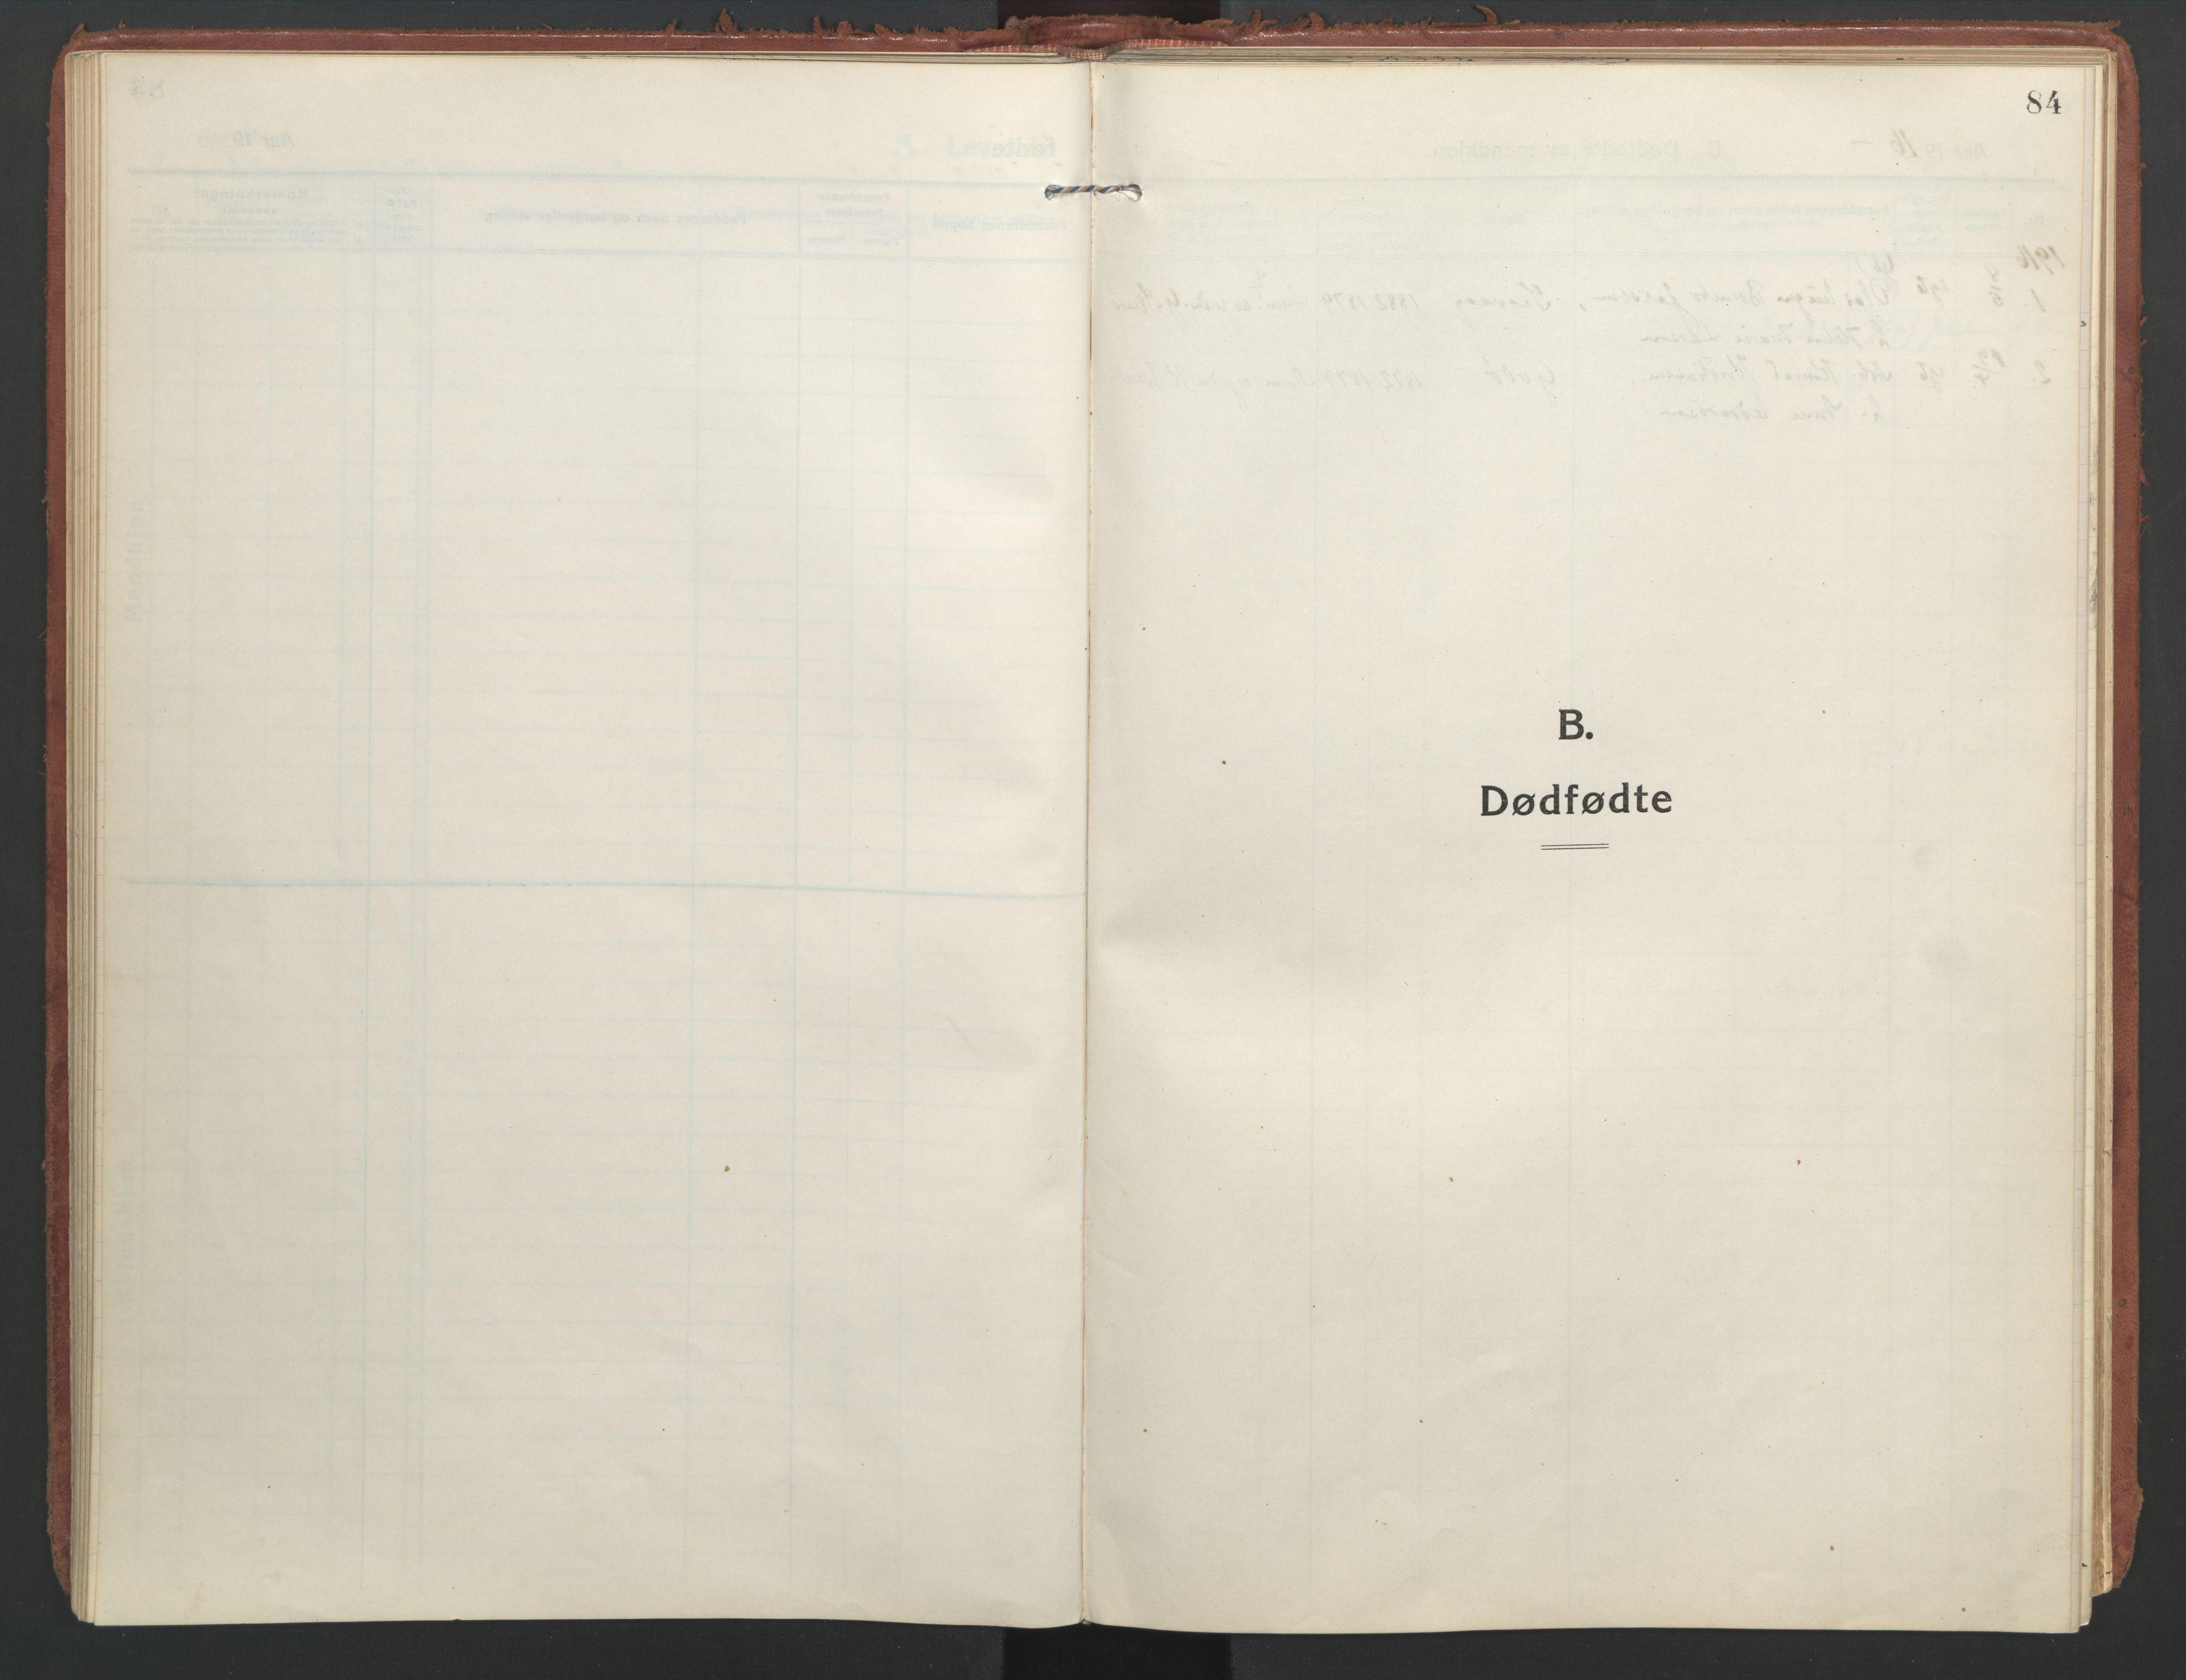 SAT, Ministerialprotokoller, klokkerbøker og fødselsregistre - Nordland, 804/L0086: Ministerialbok nr. 804A07, 1916-1935, s. 84